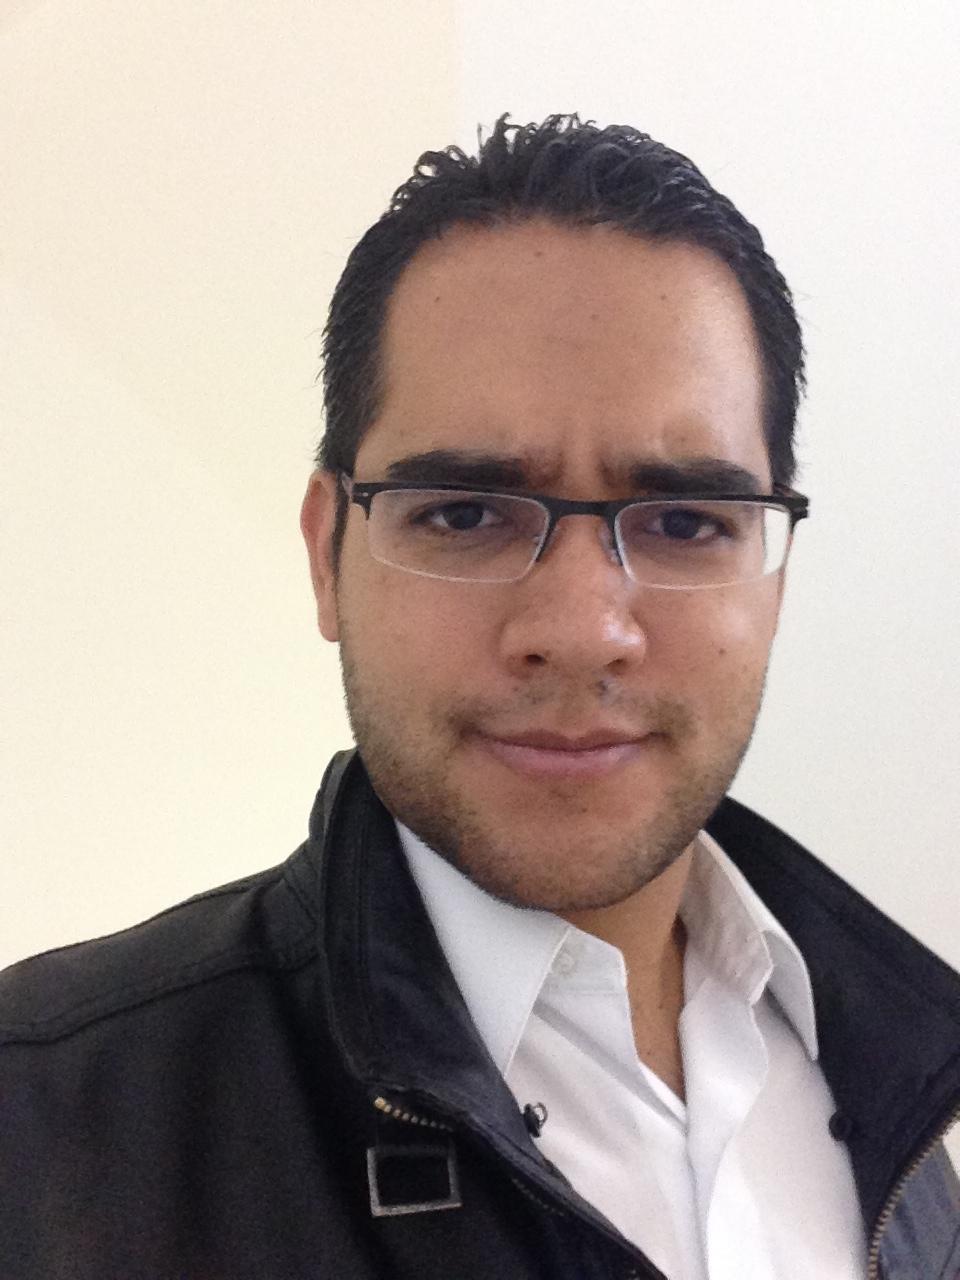 Hector Gustavo Serrano Gutierrez